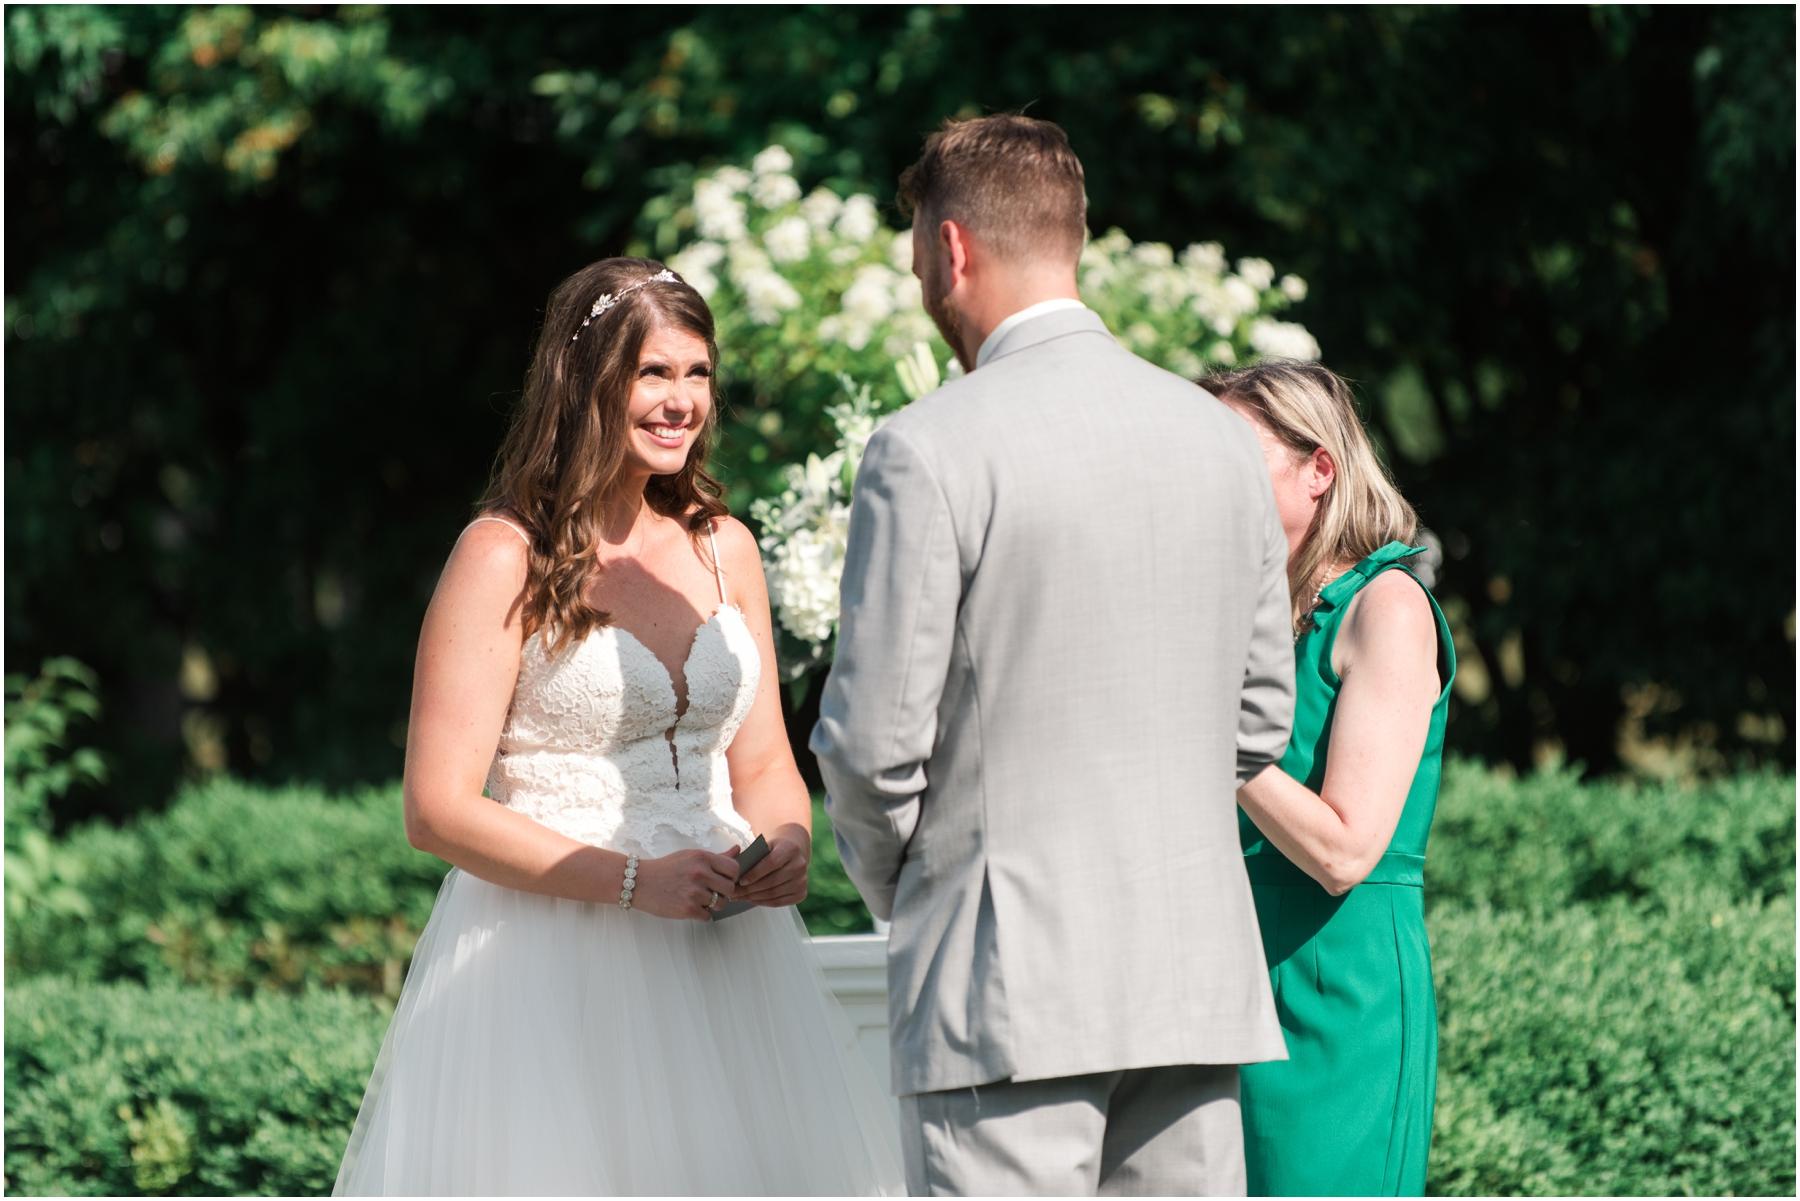 Bloom Field Gardens Wedding Precious Photography_0371